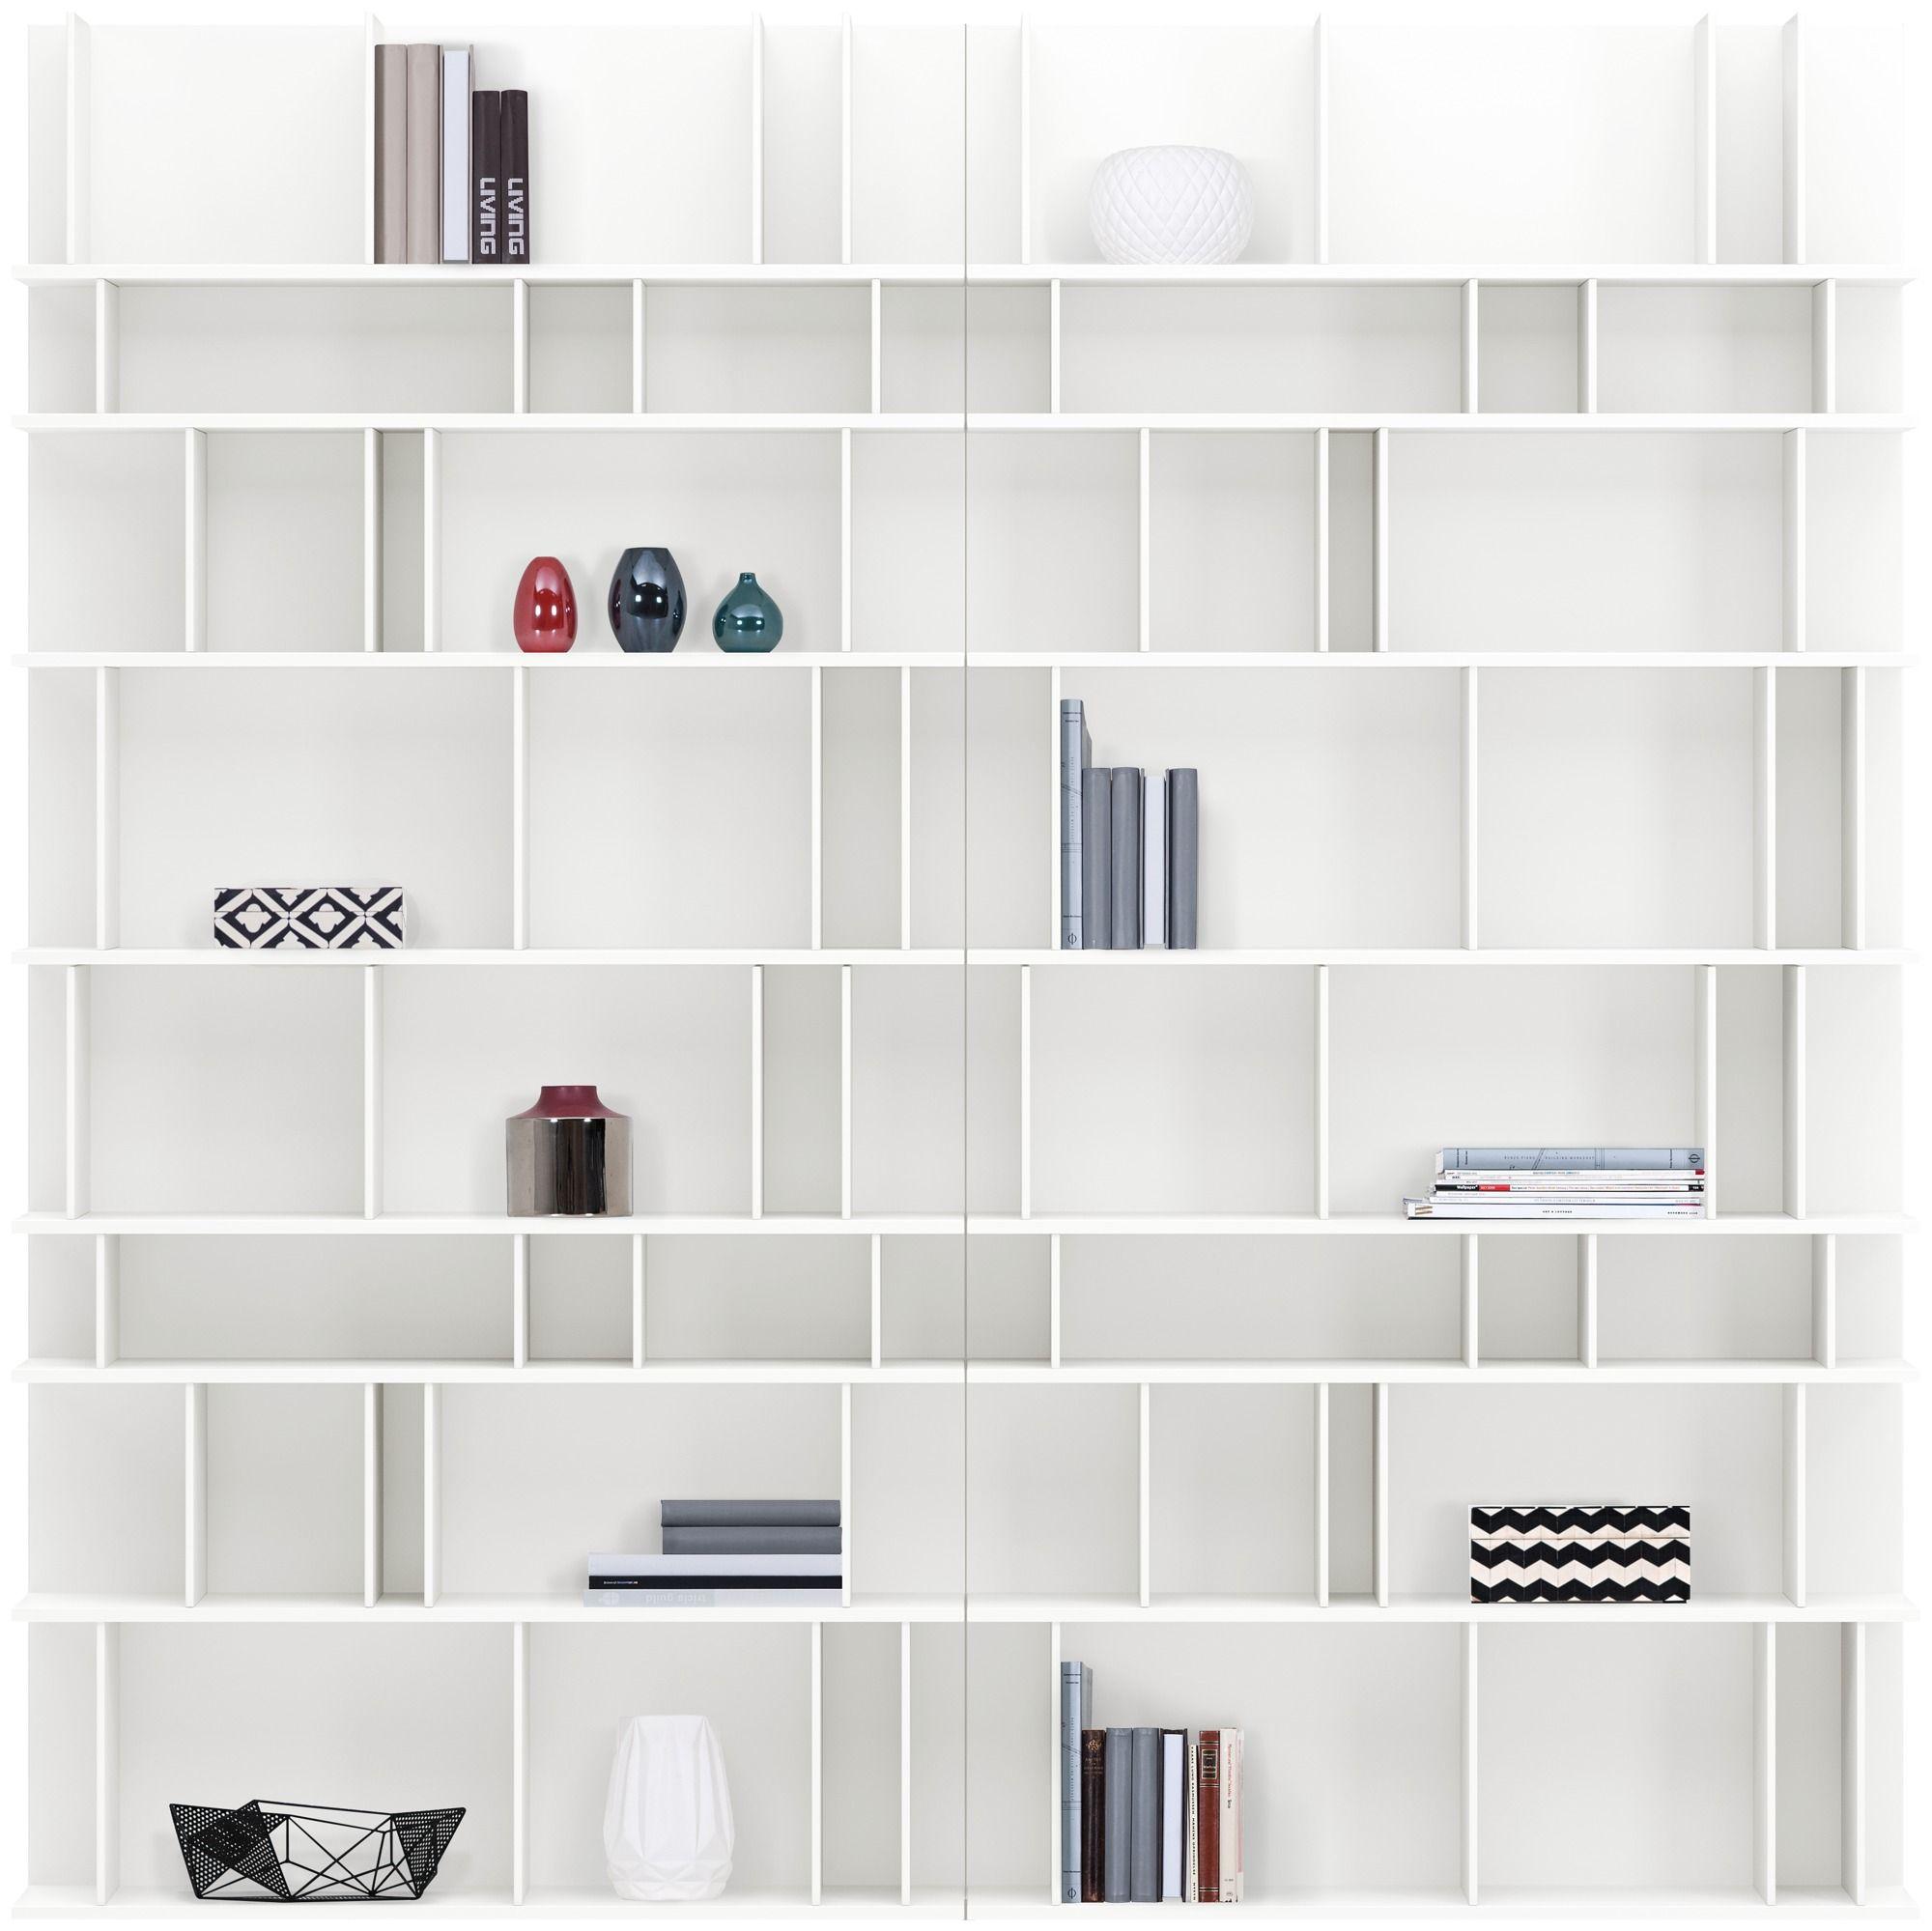 design b cherschr nke b cherregale online kaufen boconcept shakespeare pinterest. Black Bedroom Furniture Sets. Home Design Ideas